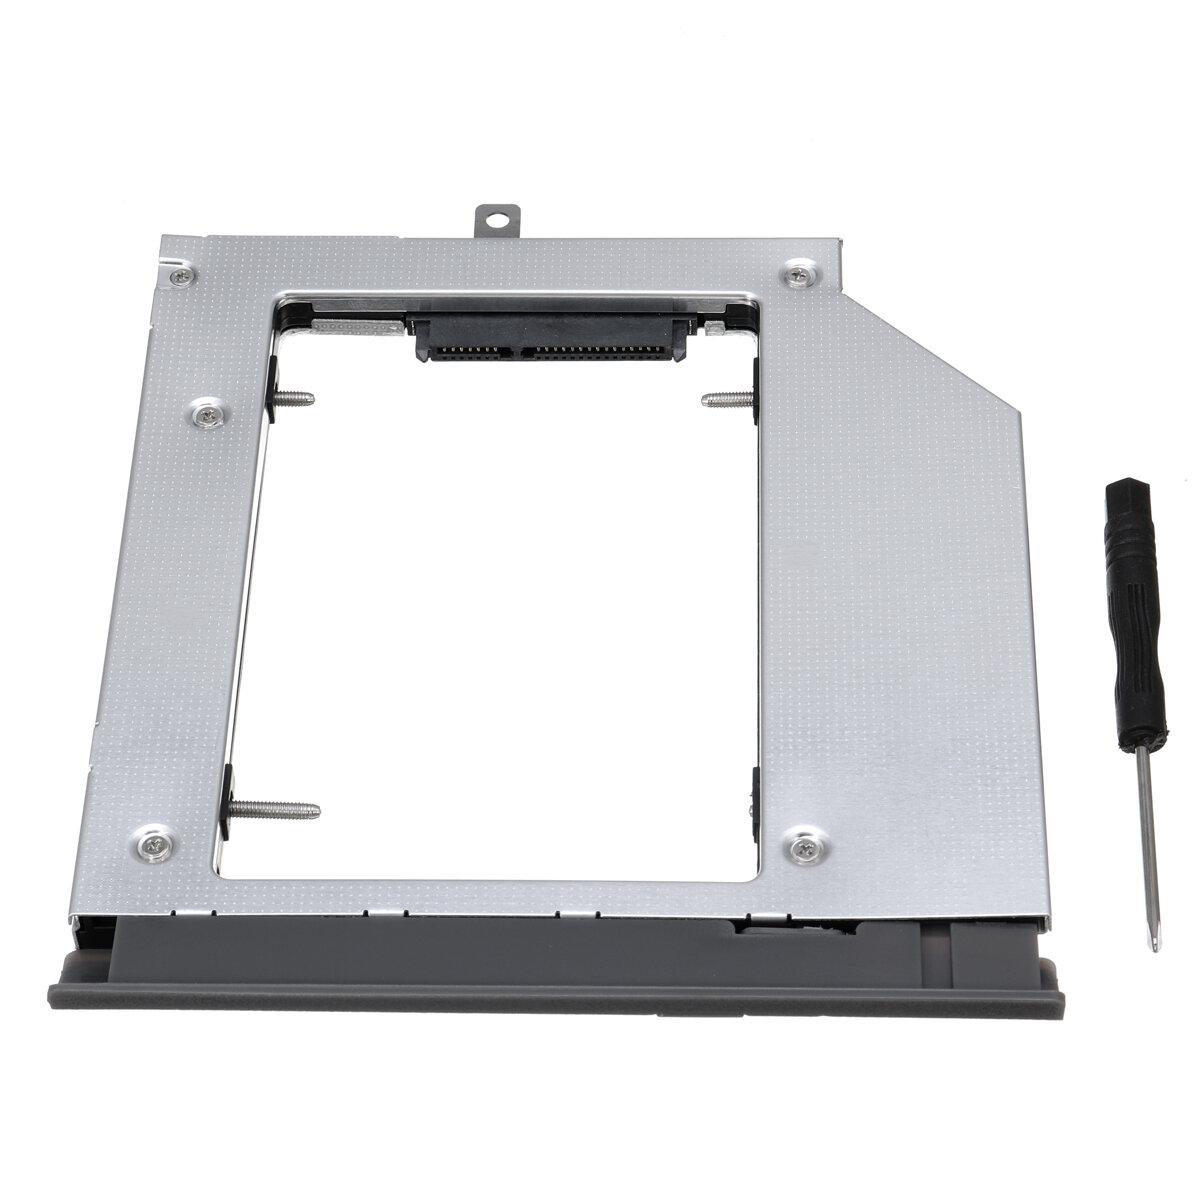 Notebook Optical Drive Bay Hard Drive Caddy For Lenovo ideapad 320 330 520 Converter